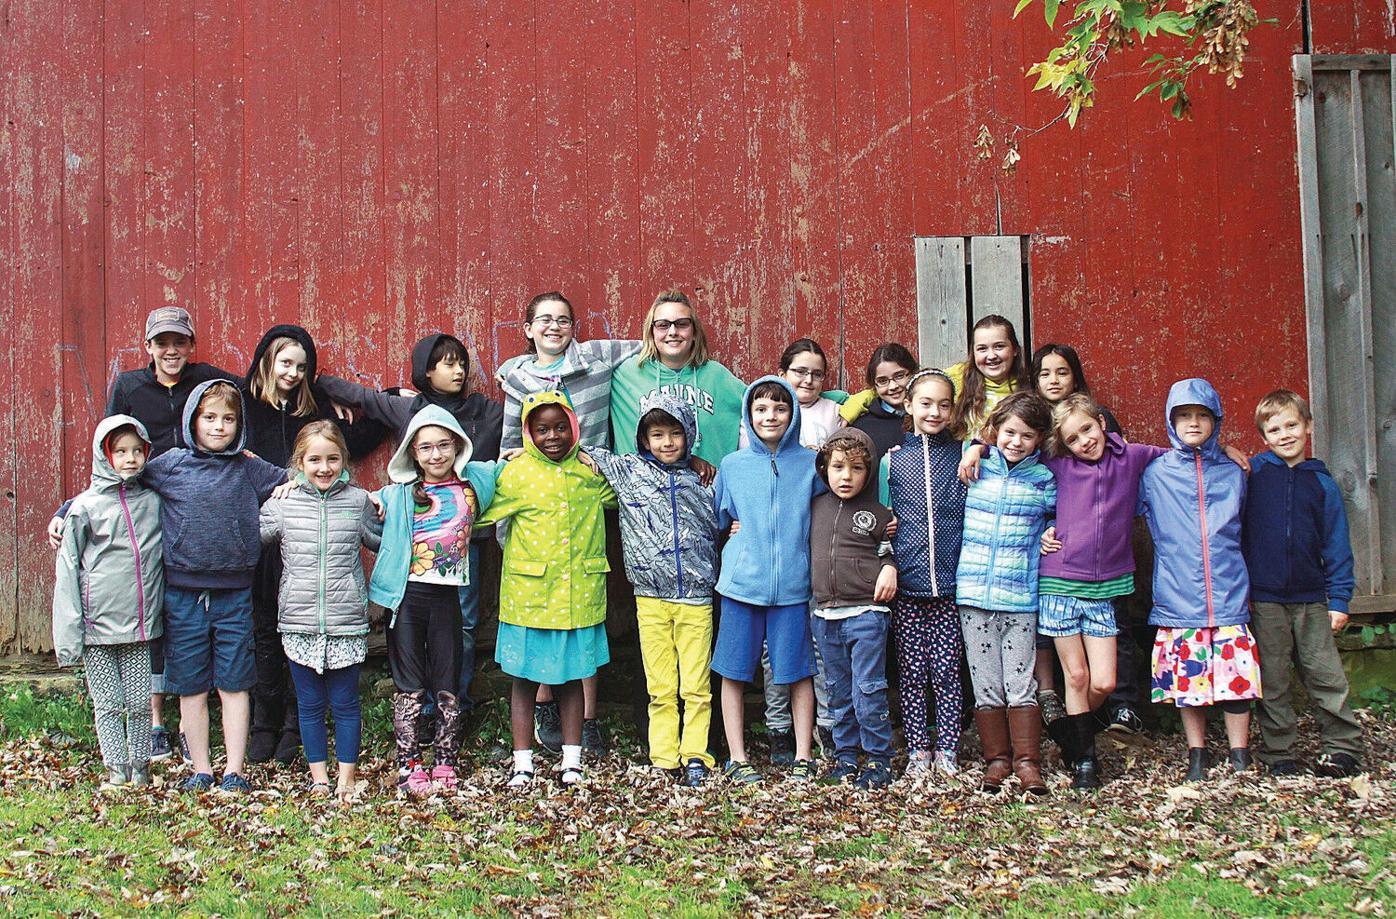 School gets grant to restore historic barn